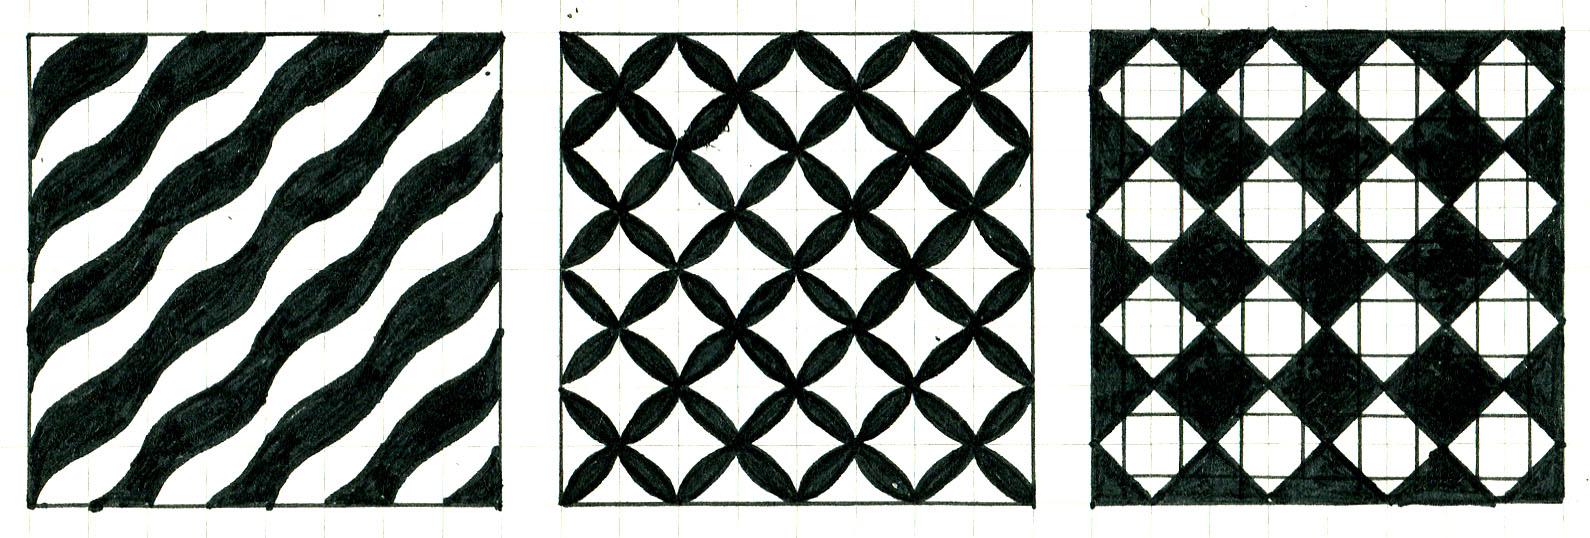 Rhythm And Pattern « Design Patterns